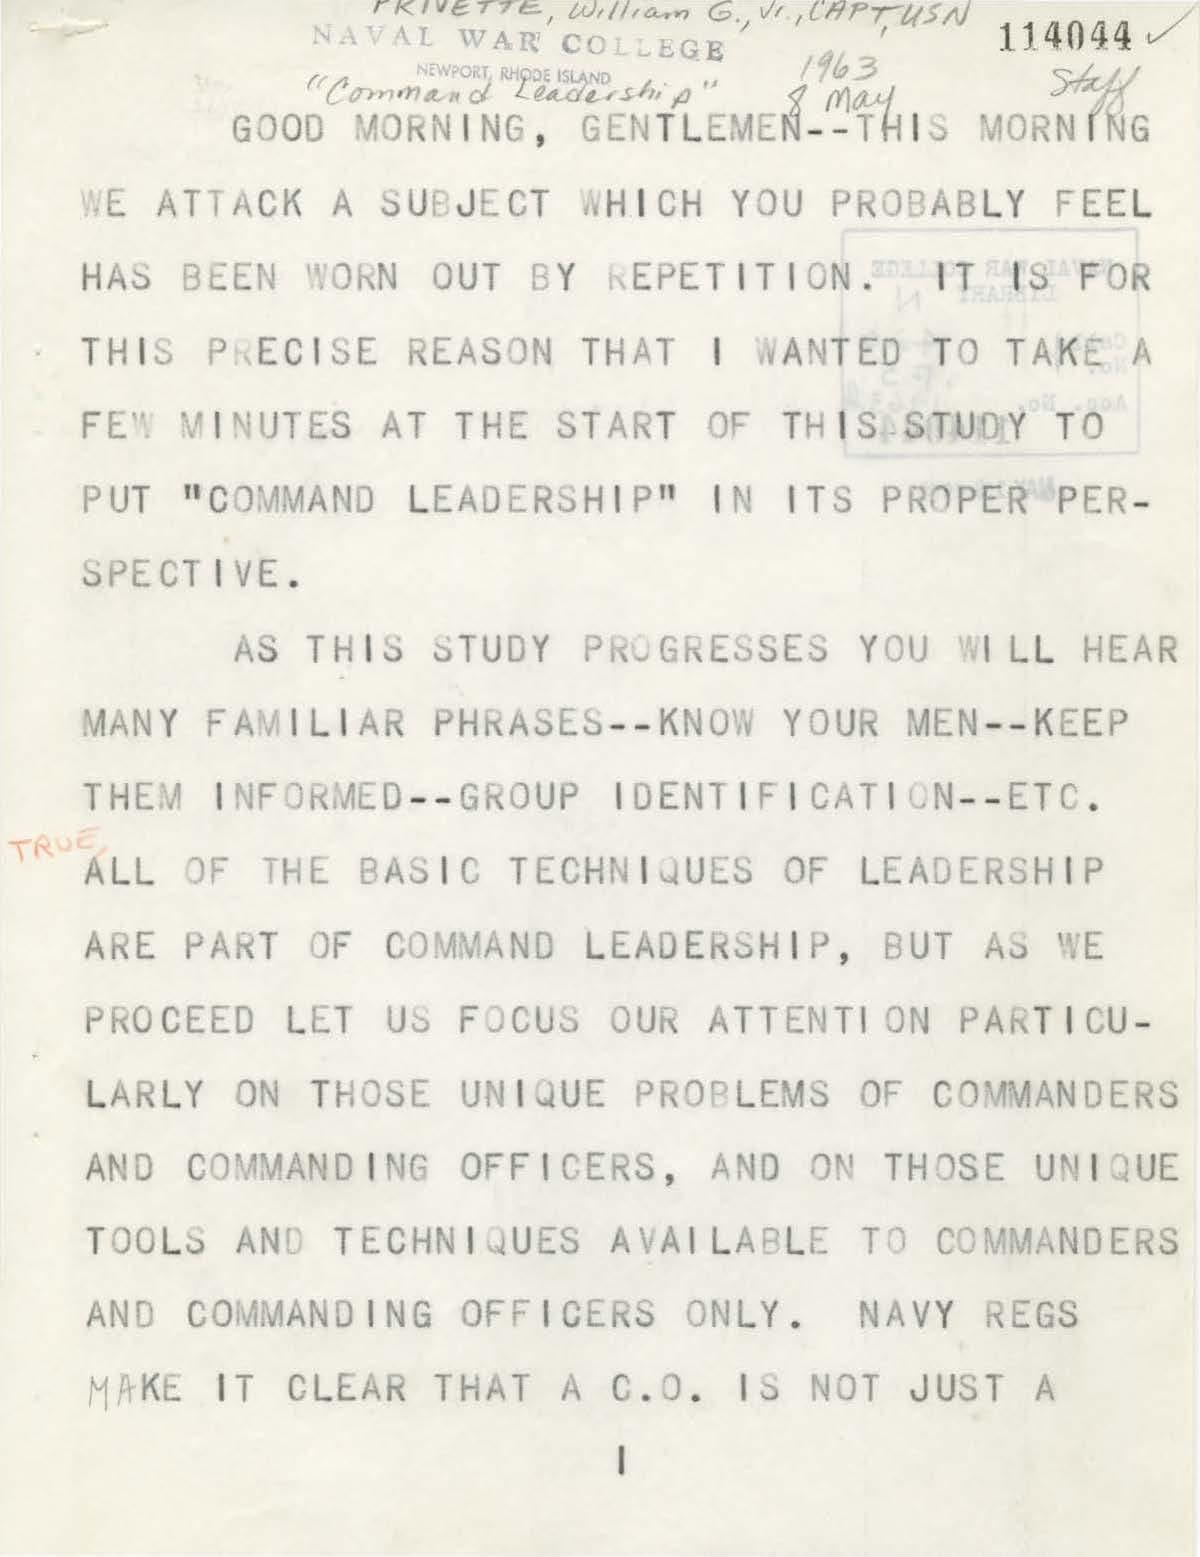 Command Leadership, W. Privette